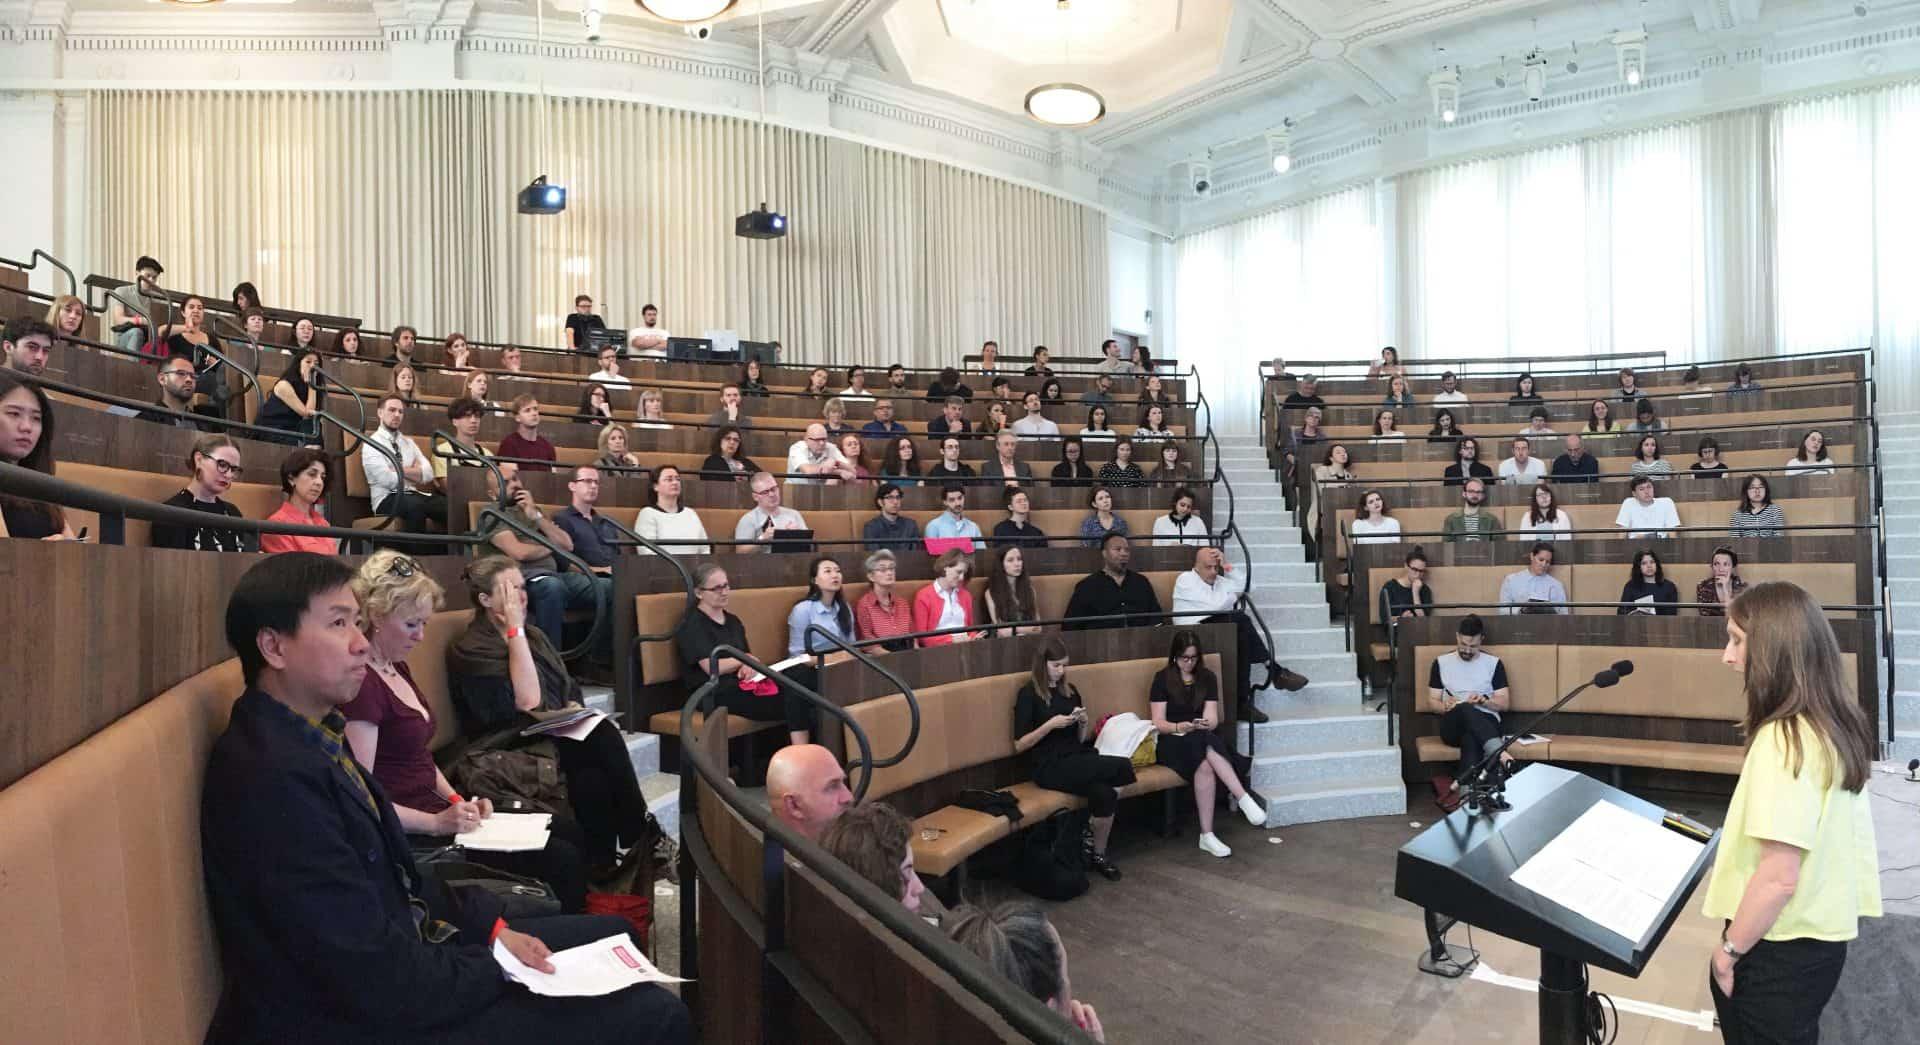 LFA Symposium: Call for Participants